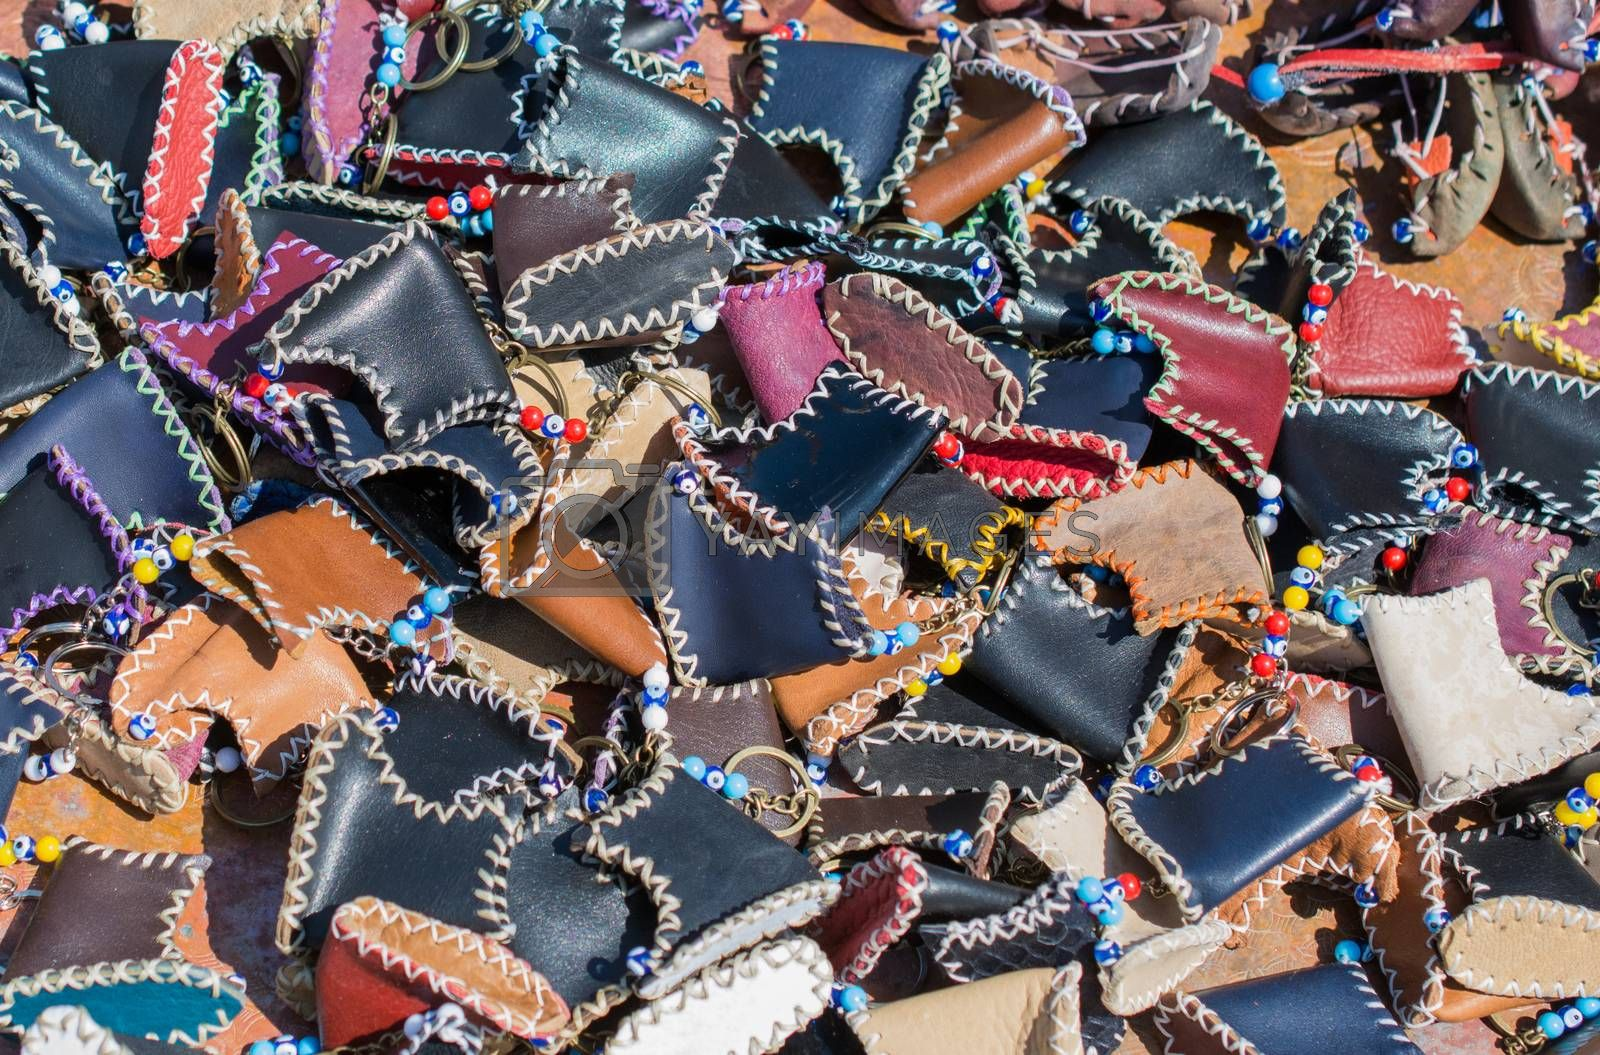 Set of traditional hand made Yemeni shoes